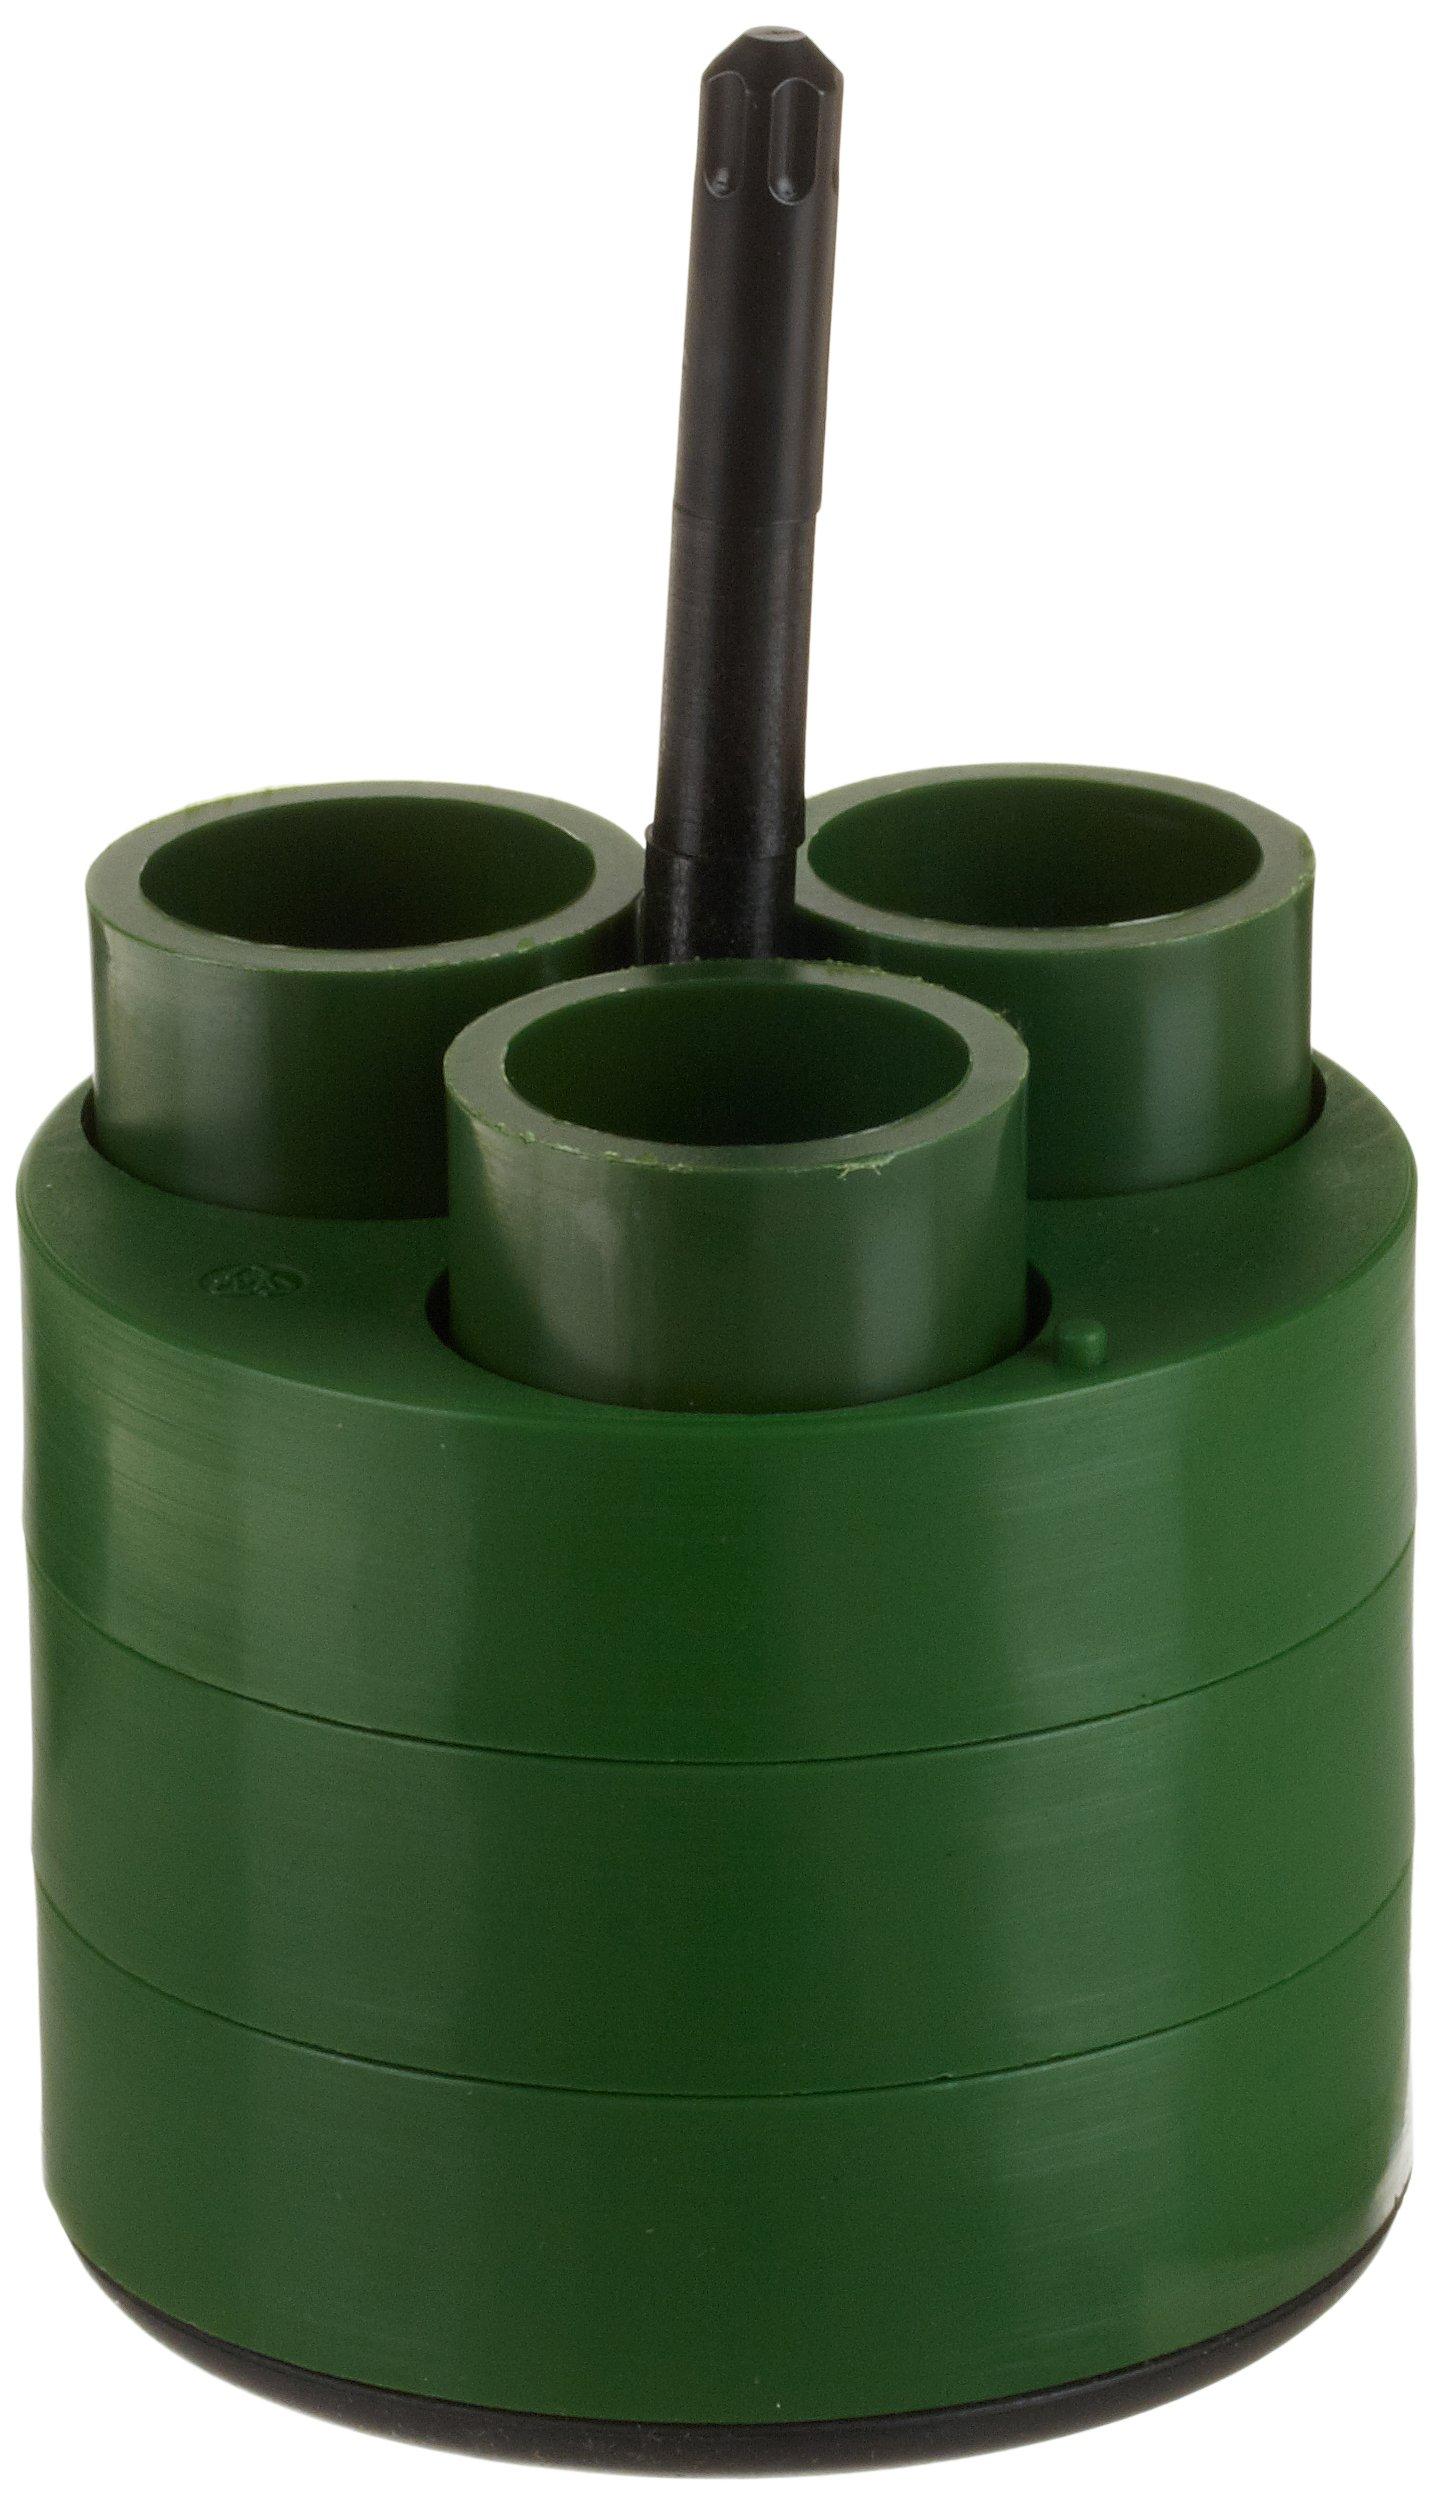 Thermo Scientific Adapter, 3 x 25mL Universal Tube, Green